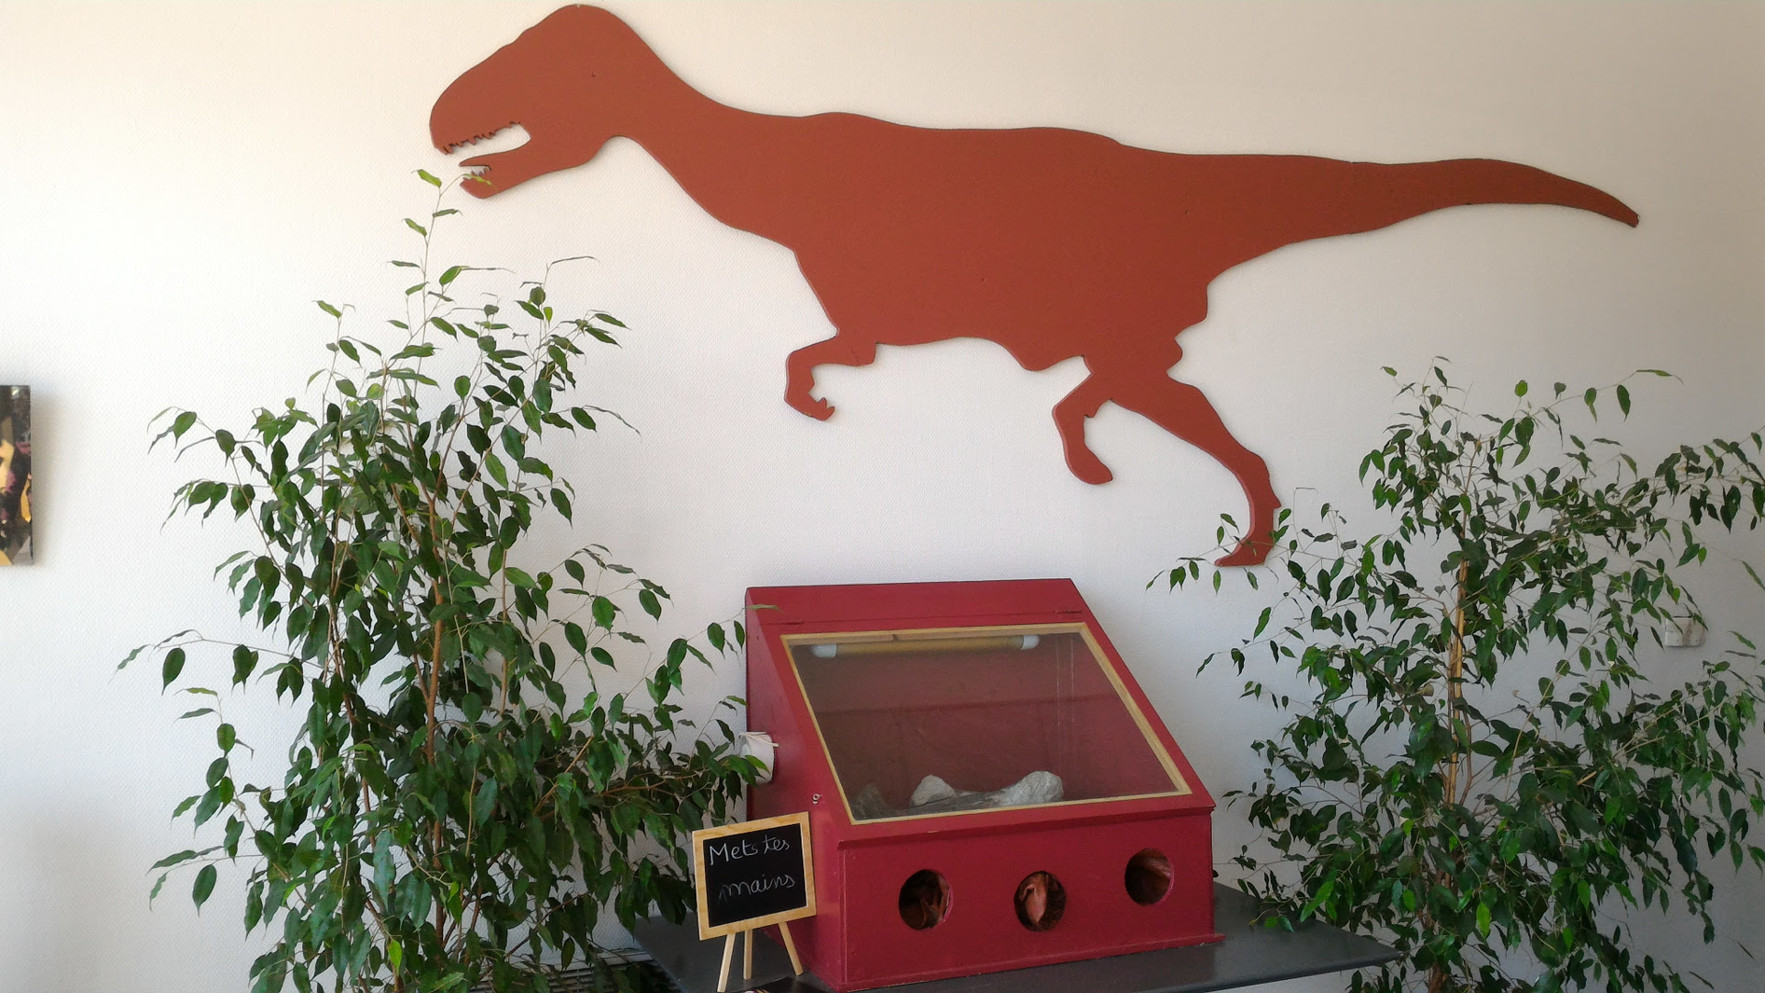 FHD Deuil la Barre Dinosaurs 6.jpg